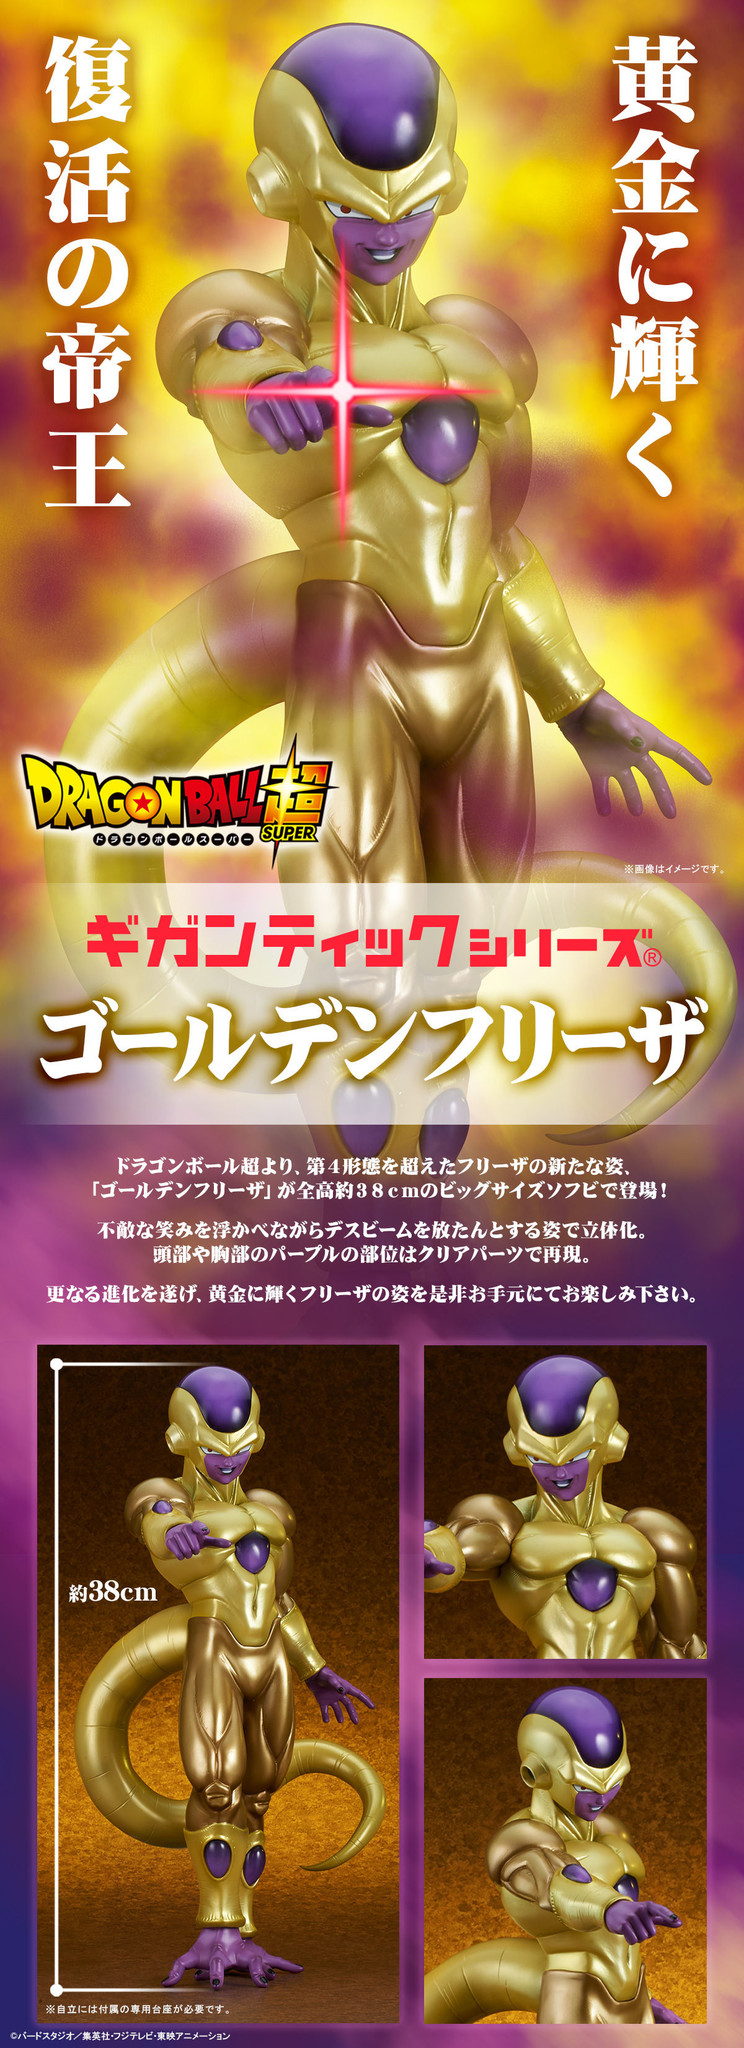 Link a X-Plus Golden Freezer Gigantic Series da Dragon Ball Super – (10)